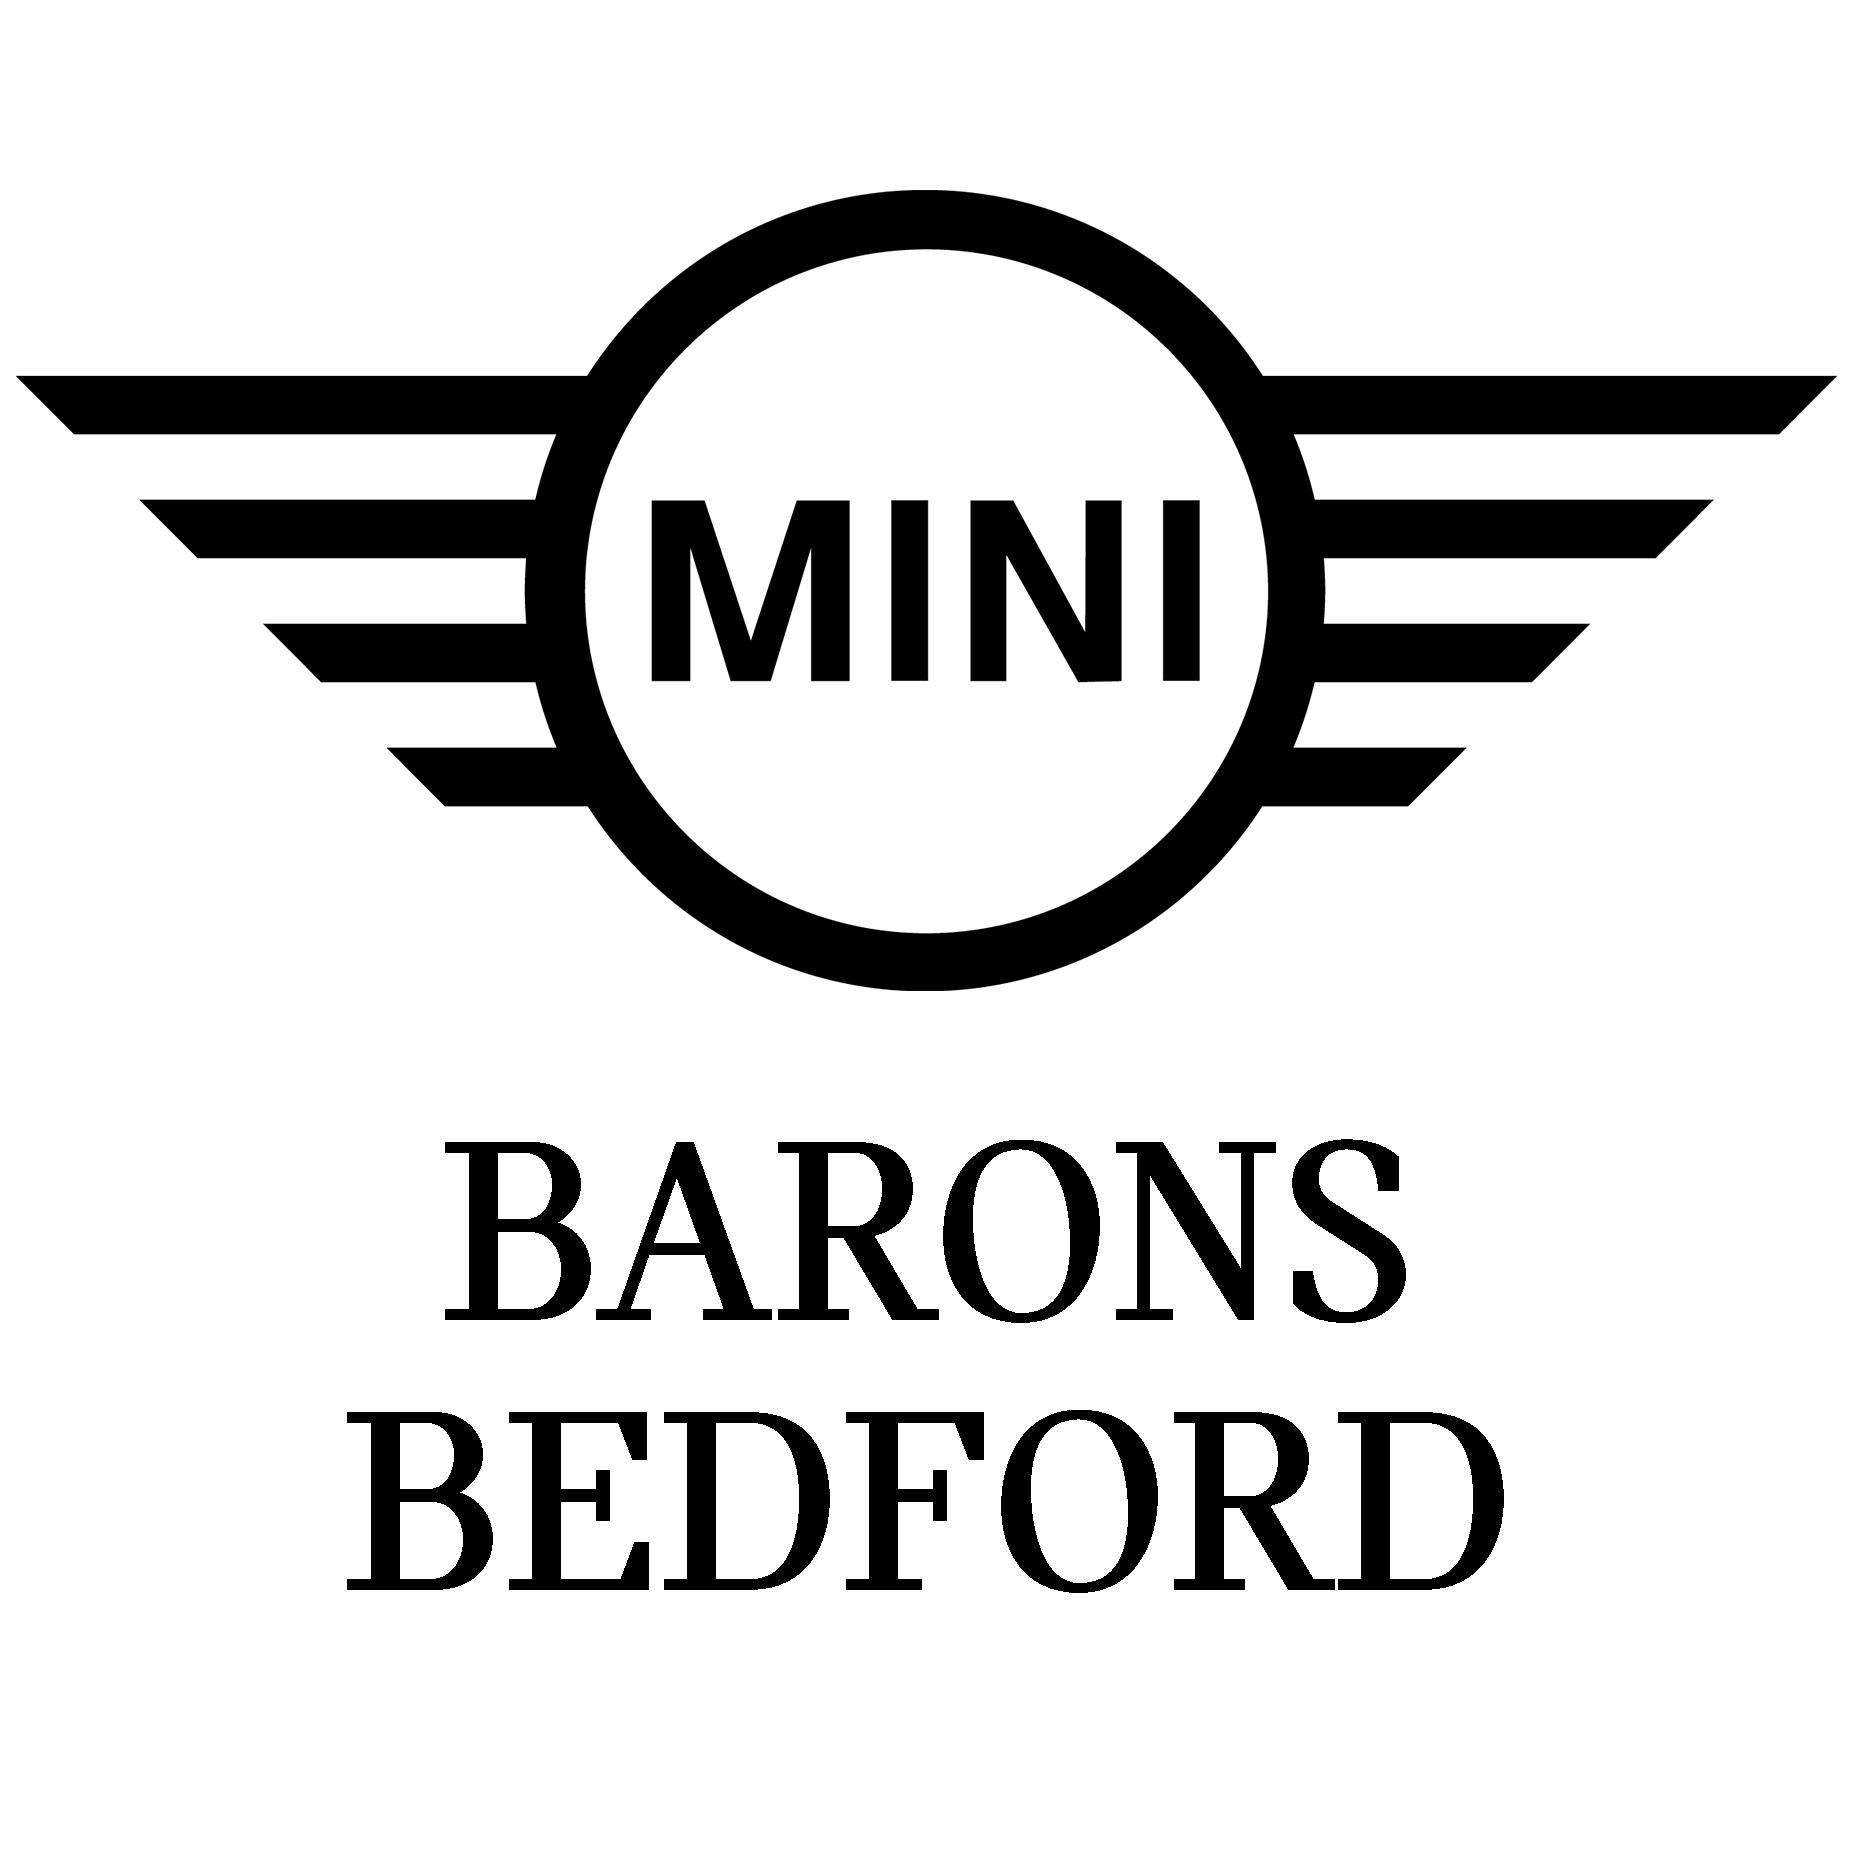 Barons Bedford MINI - Bedford, Bedfordshire MK41 0GL - 01234 434522 | ShowMeLocal.com